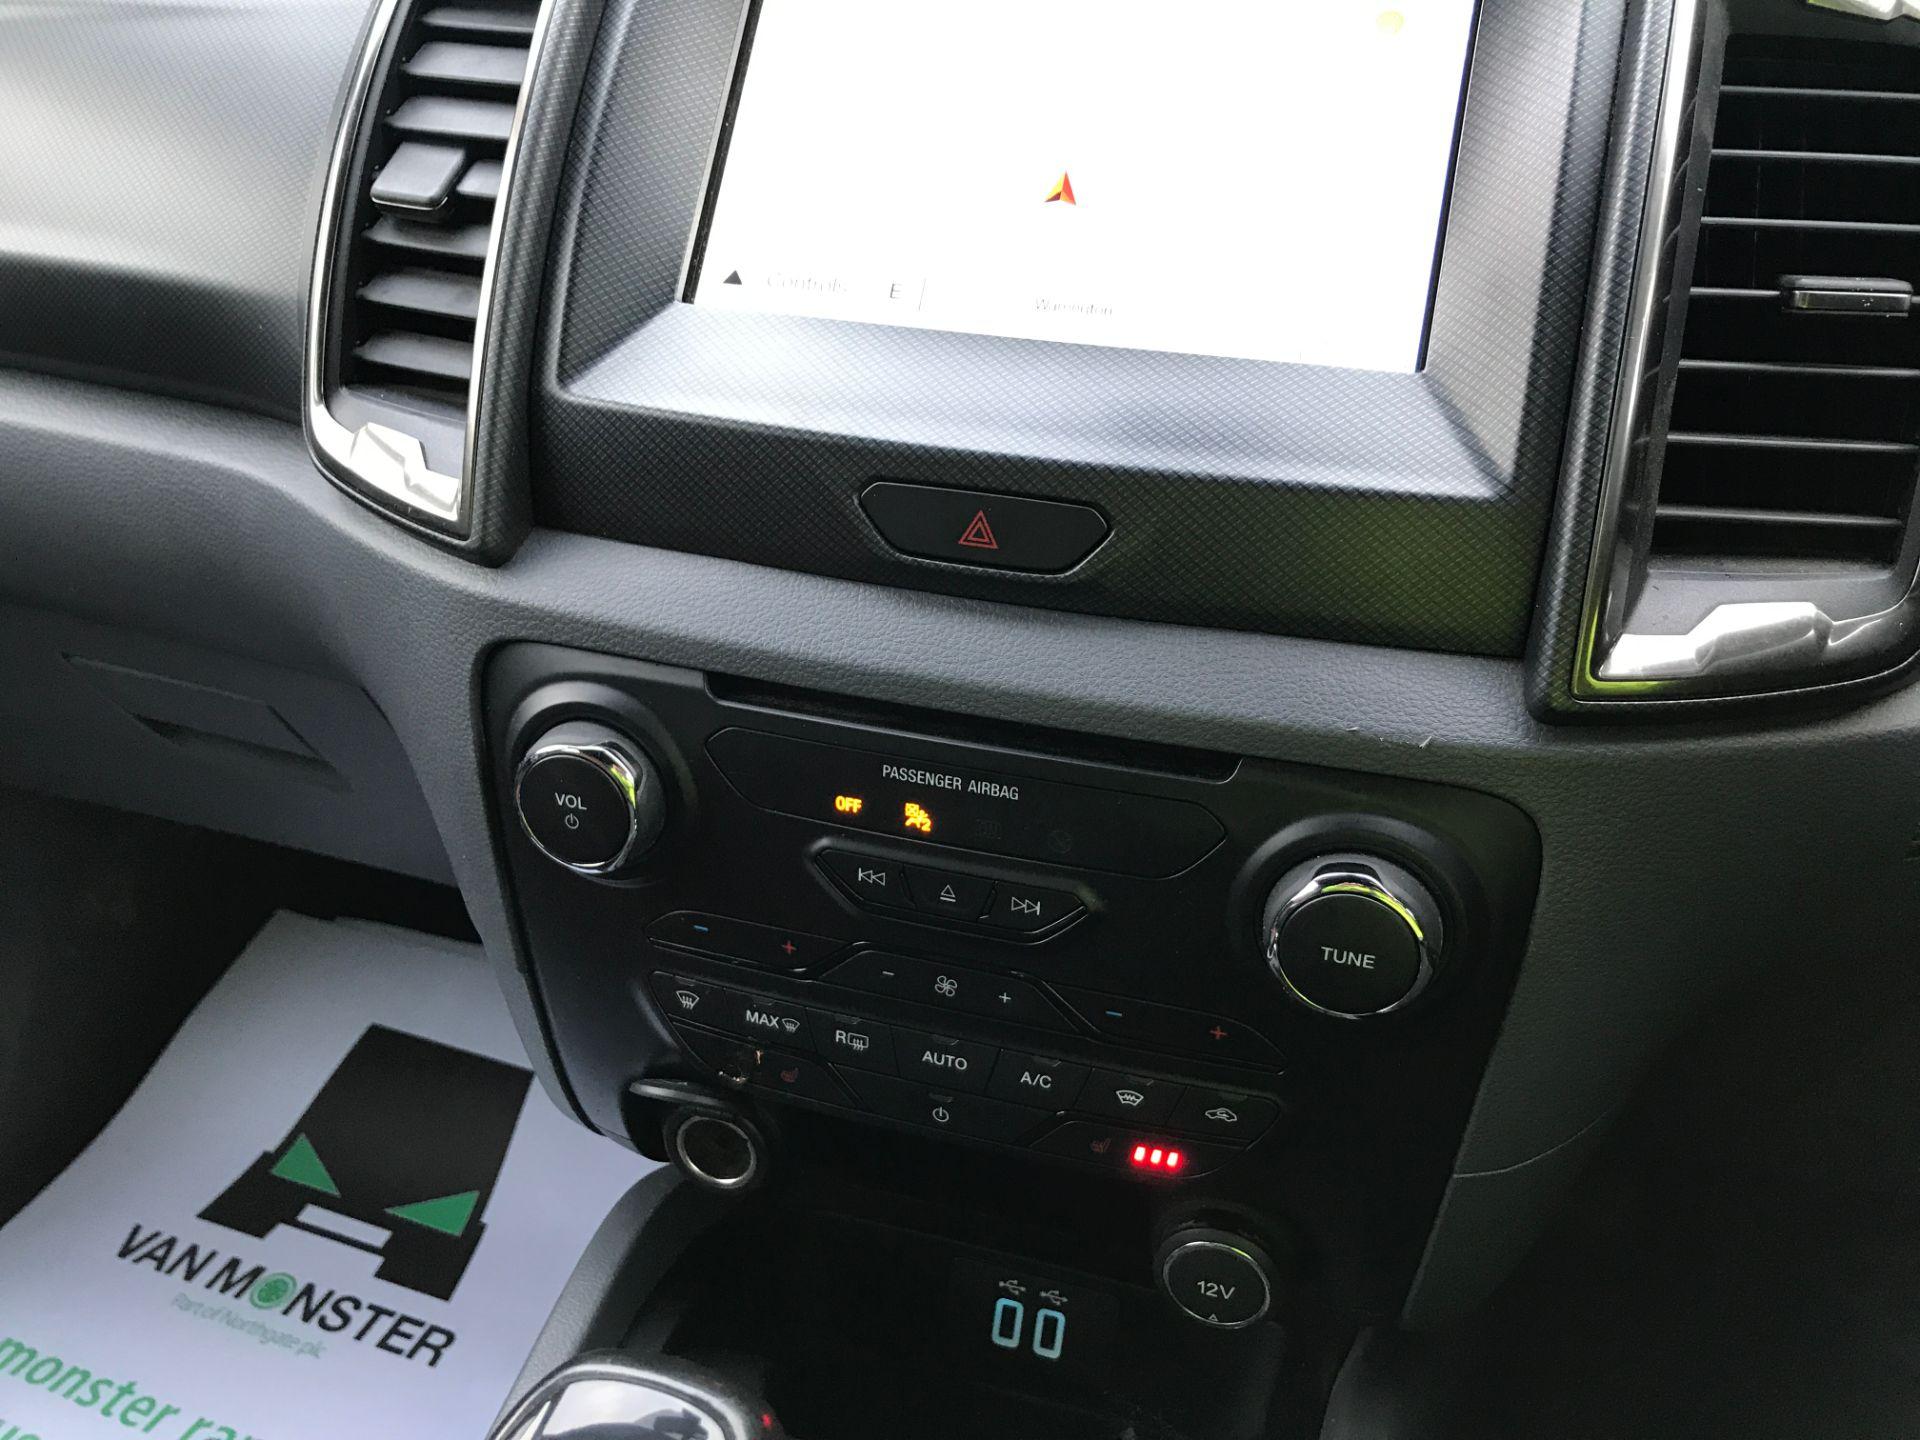 2017 Ford Ranger DOUBLE CAB 4X4 WILDTRAK 3.2TDI 200PS EURO 5 (YR67AKO) Image 3